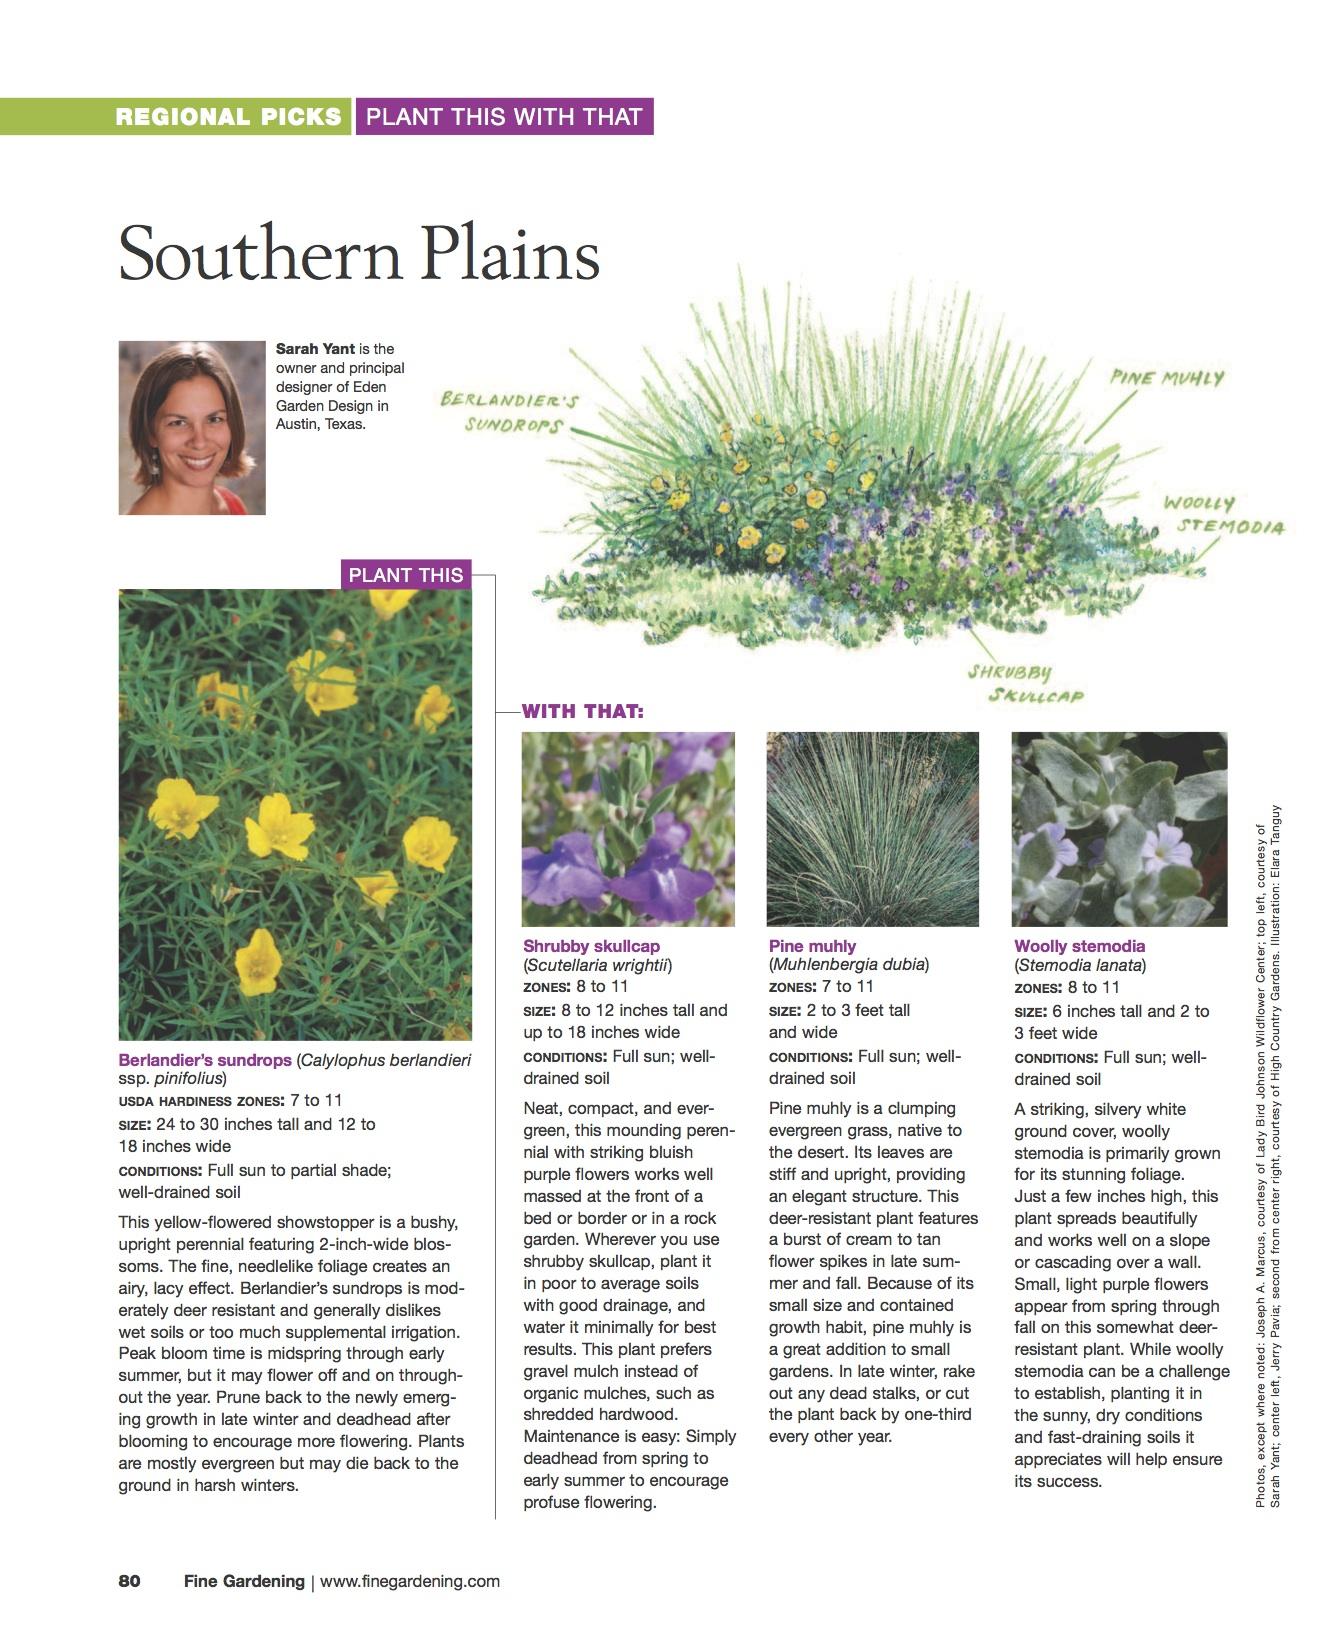 Fine gardening article spring 2012.jpg